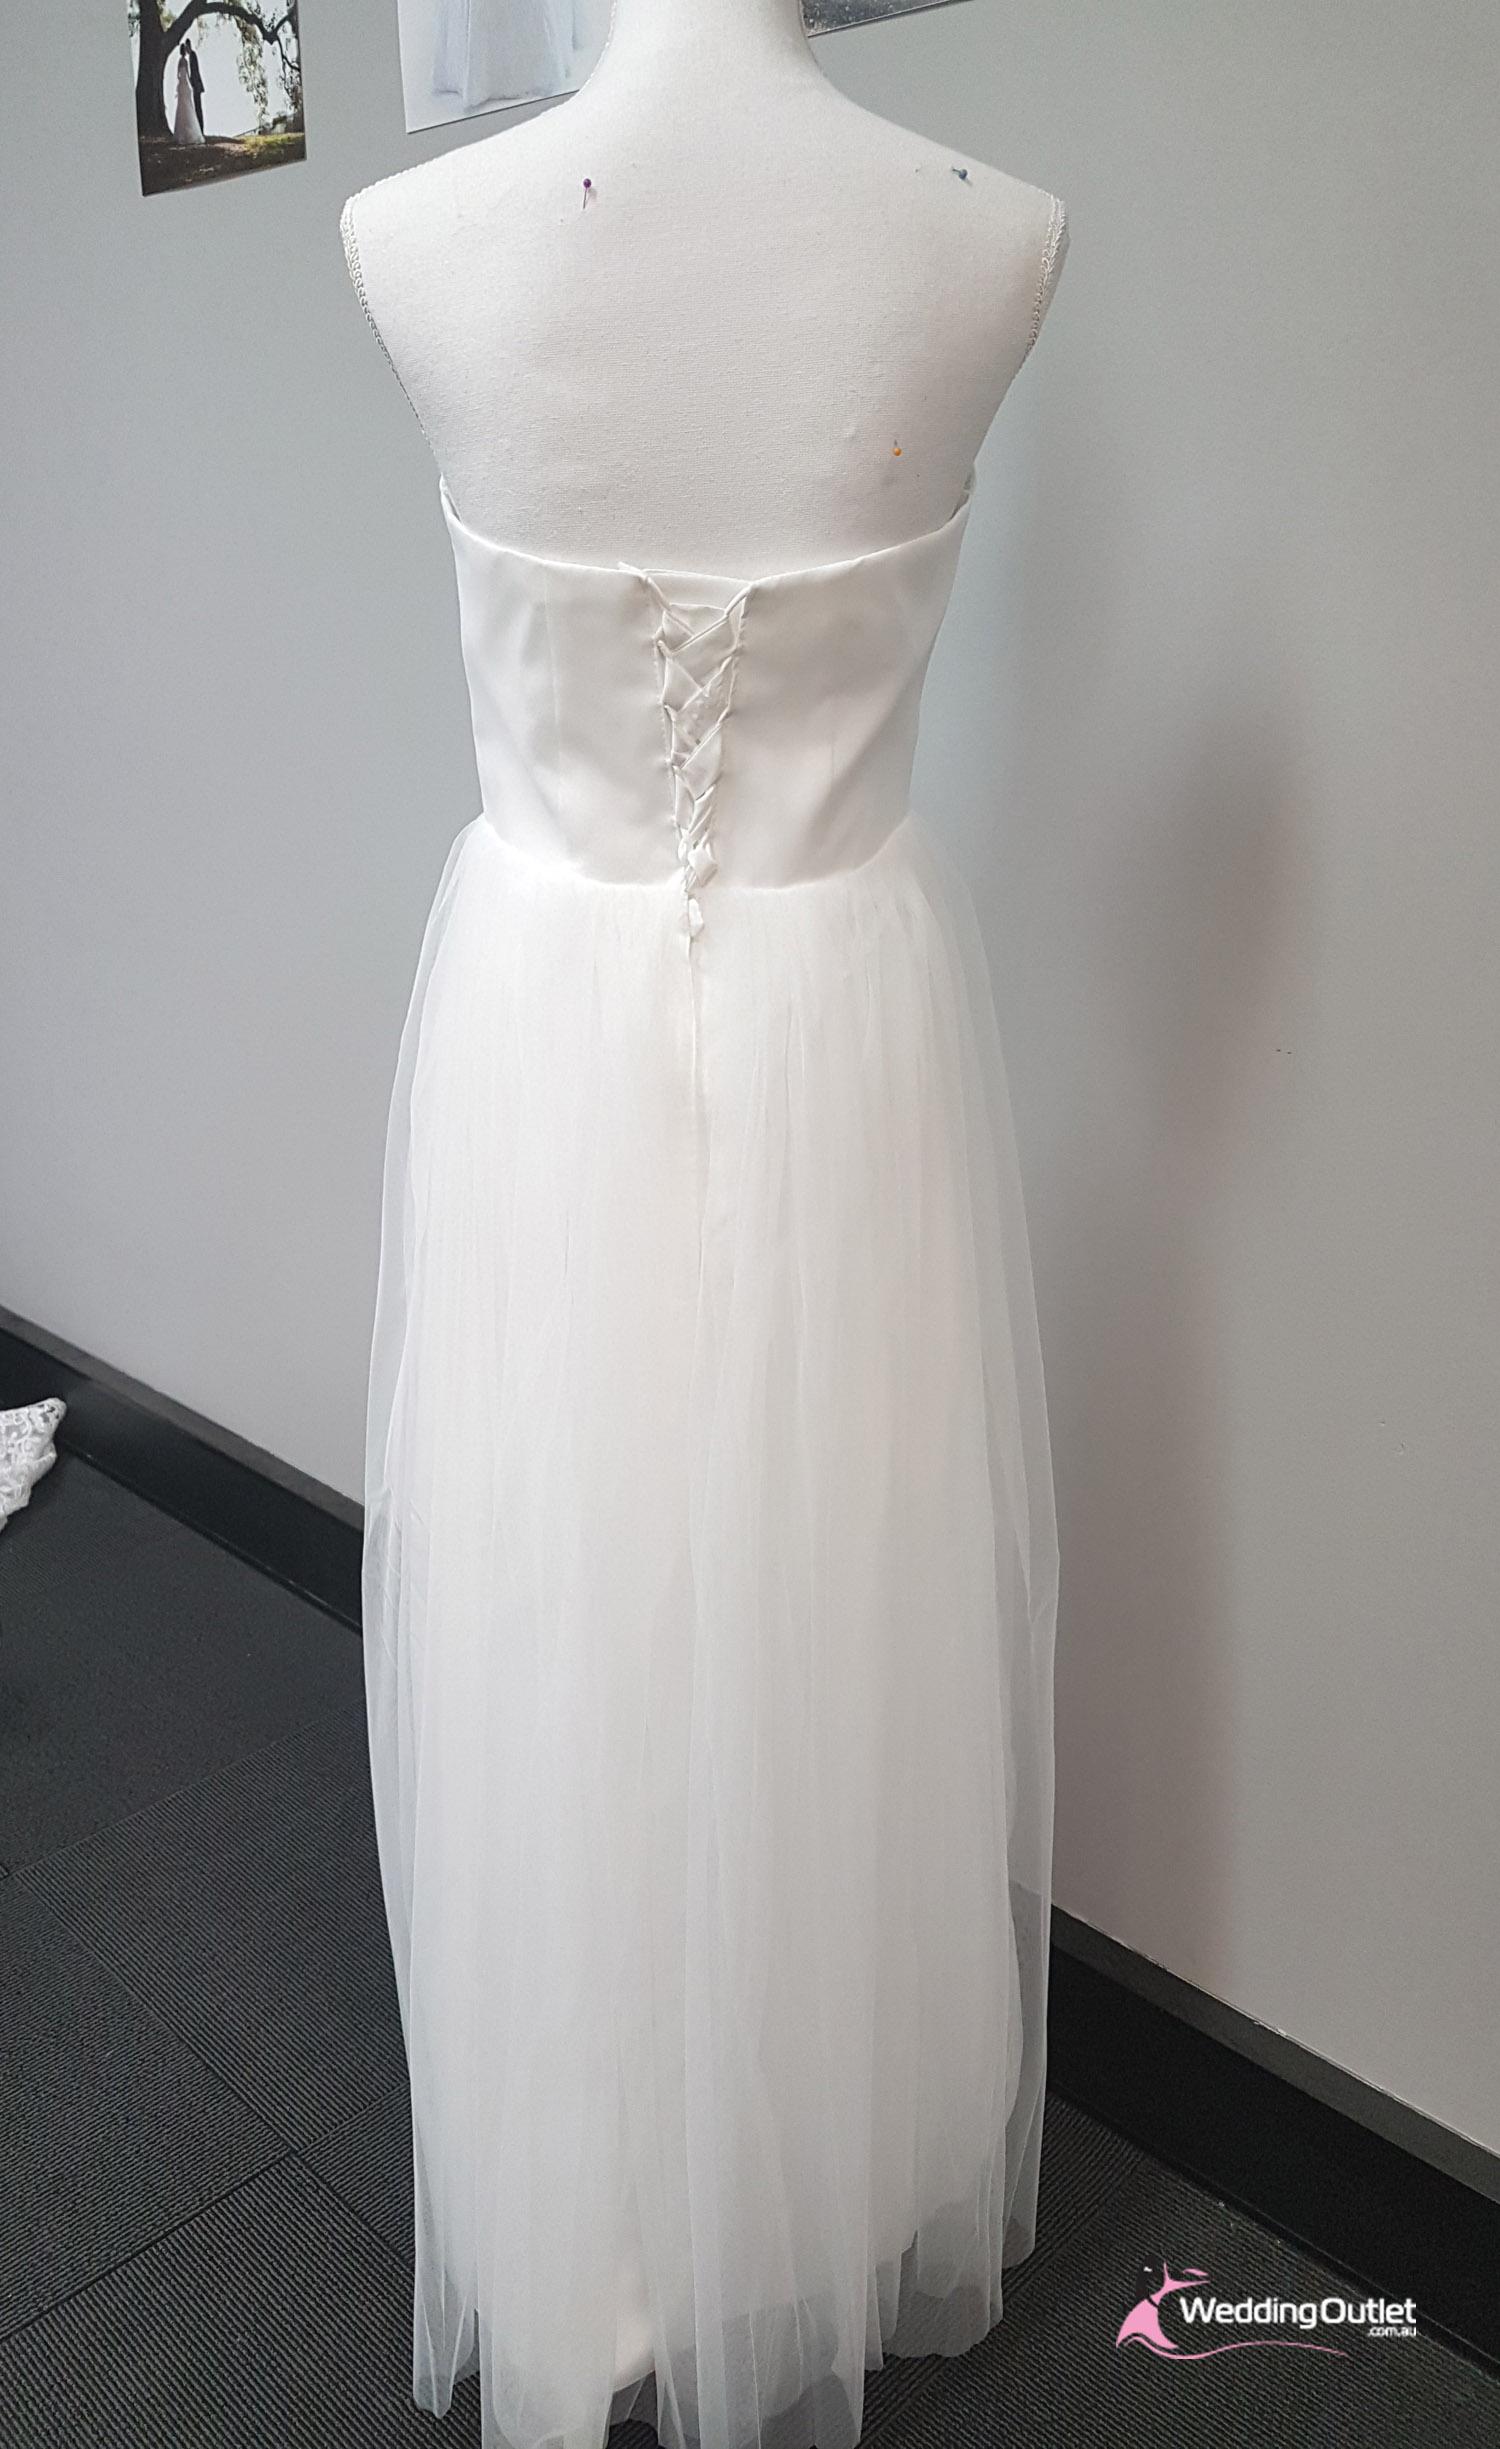 Salerno Convertible Debutante White Wedding Dress - WeddingOutlet.com.au